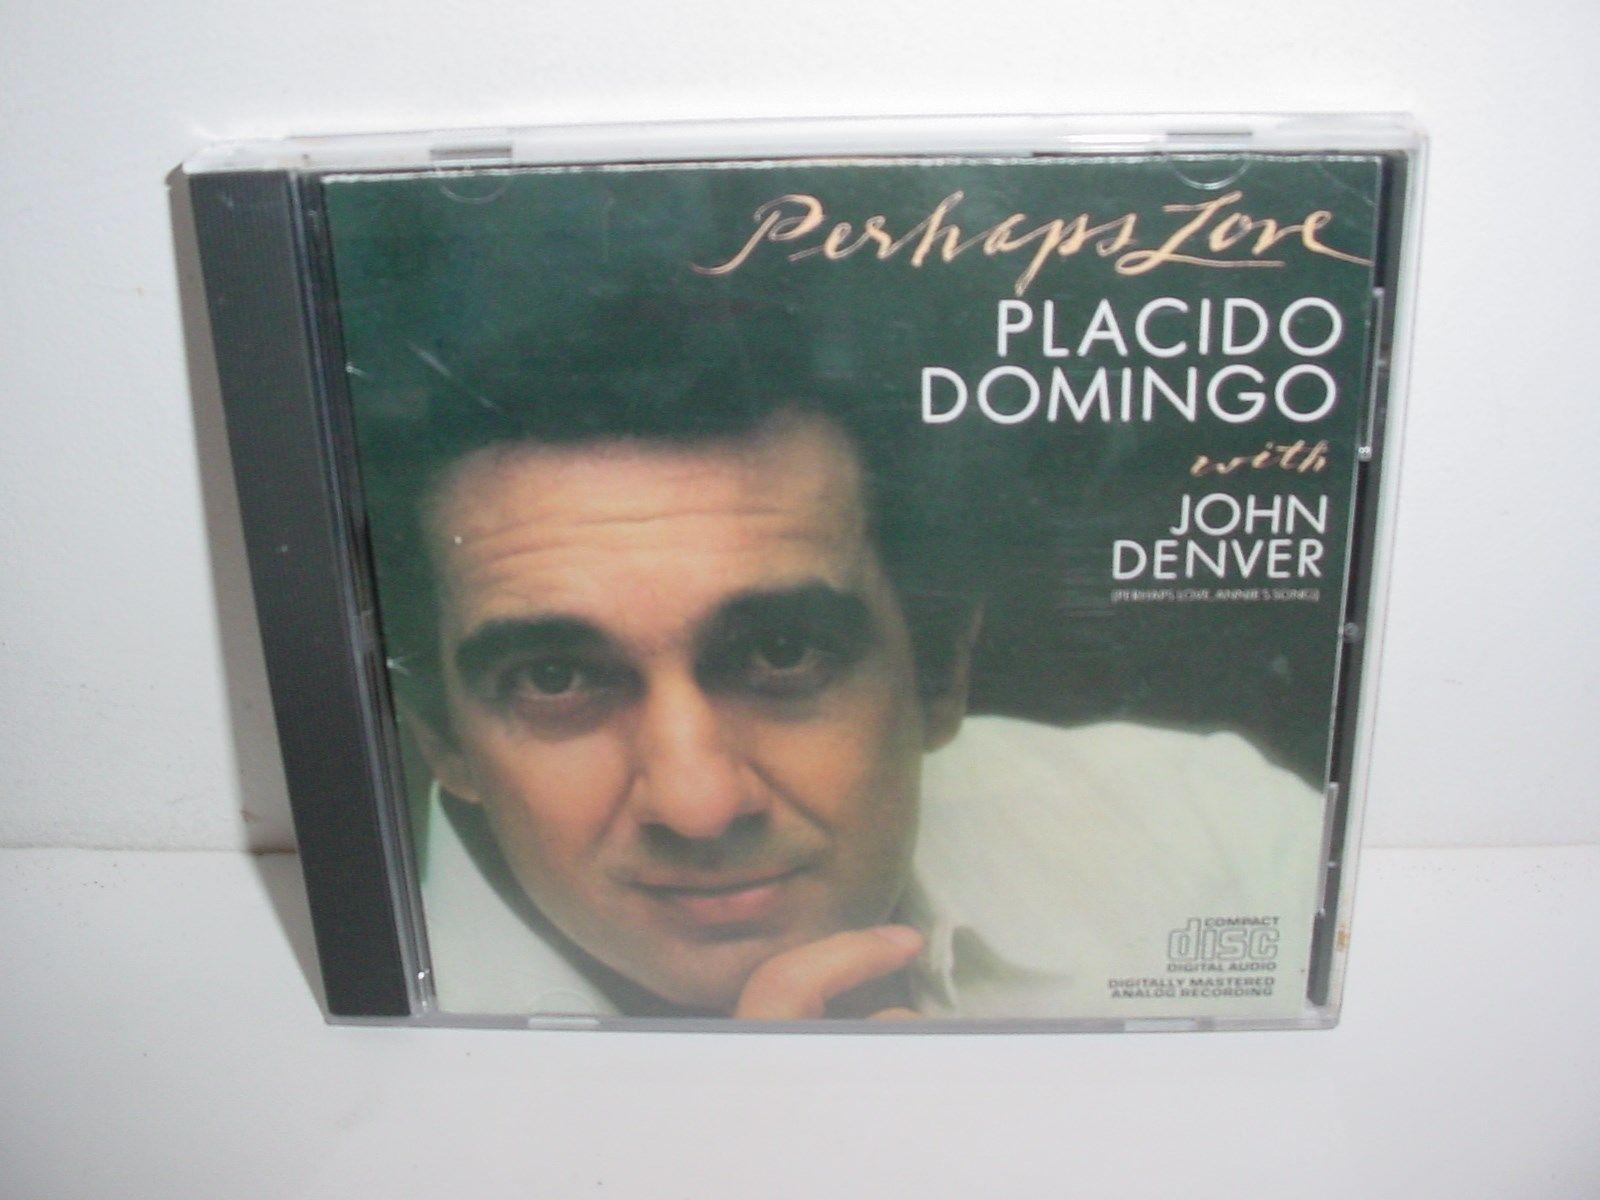 Placido Domingo Perhaps Love John Denver Music CD